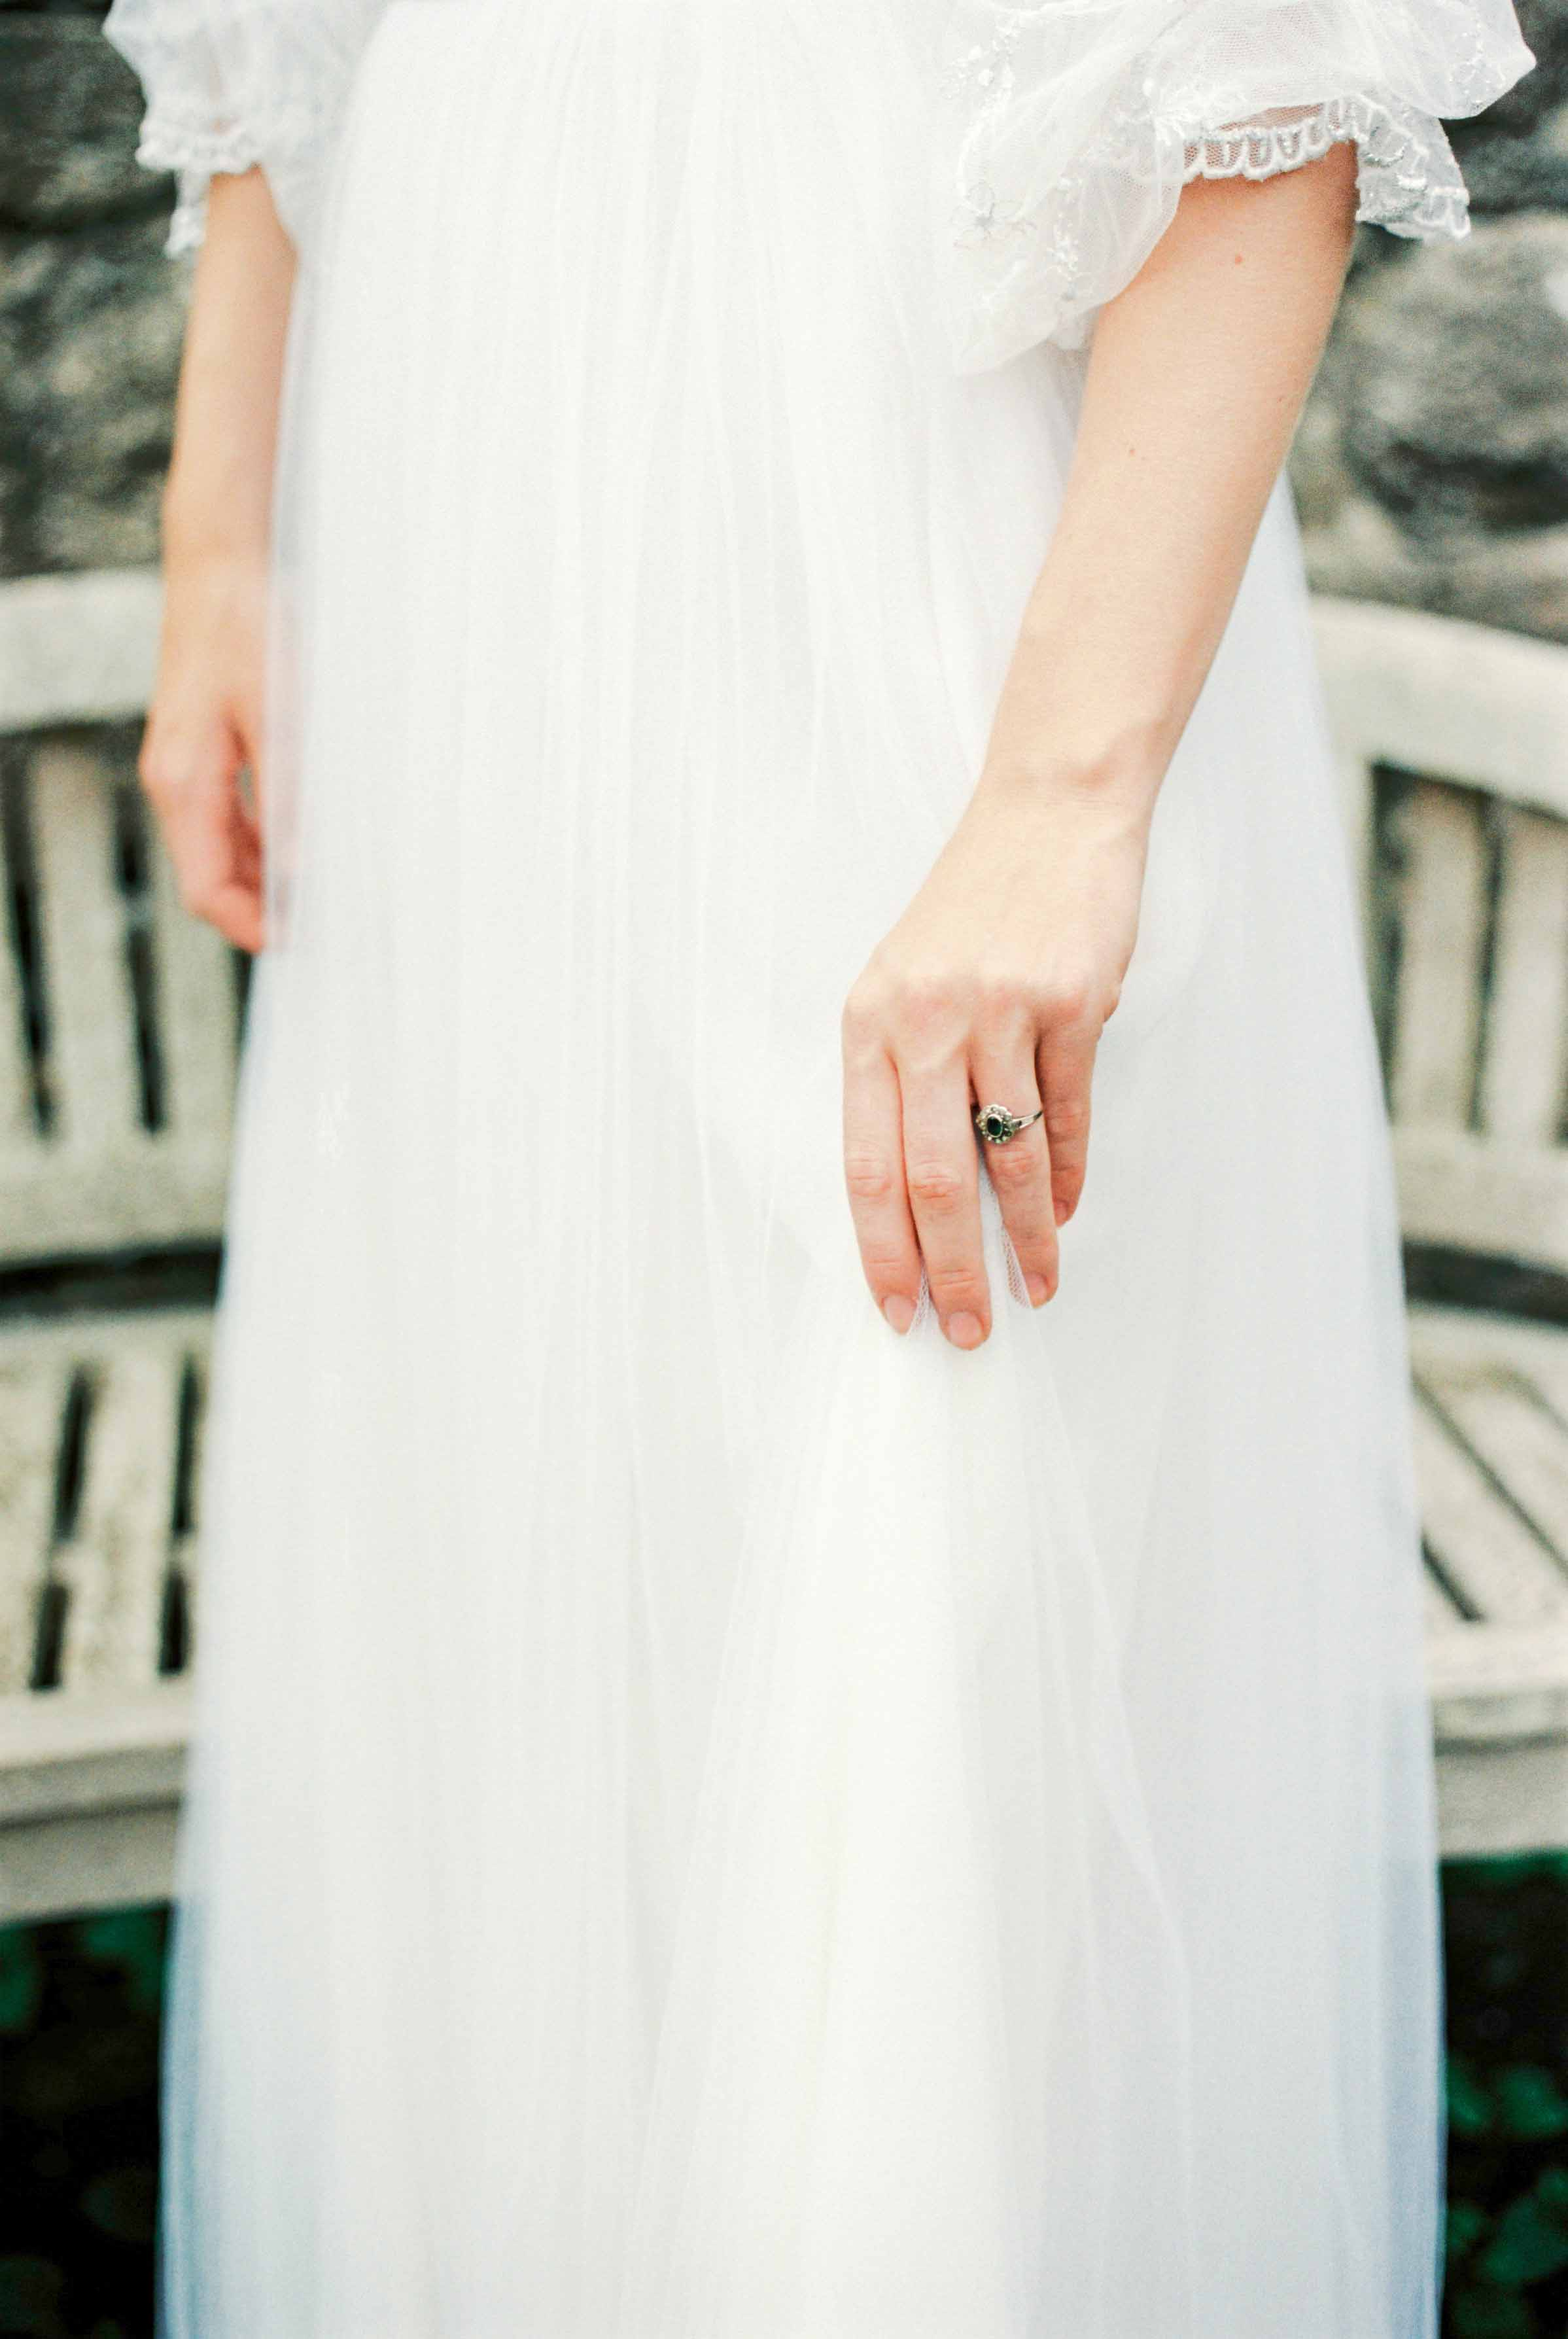 dorset-fine-art-wedding-photographer_amelia_carmencita_lores-8-of-24